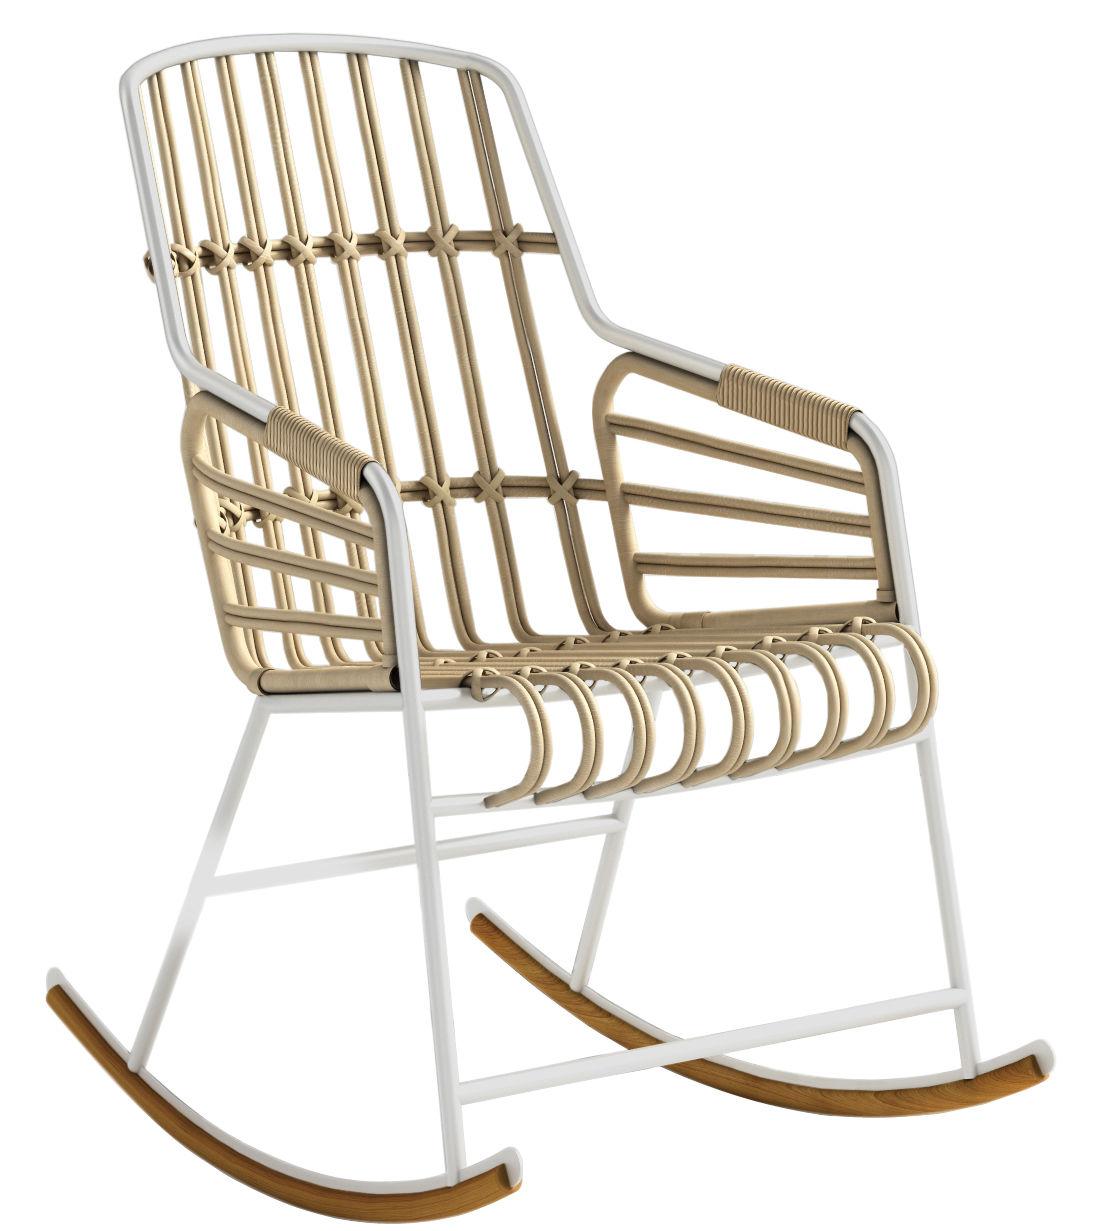 rocking chair raphia blanc casamania made in design. Black Bedroom Furniture Sets. Home Design Ideas